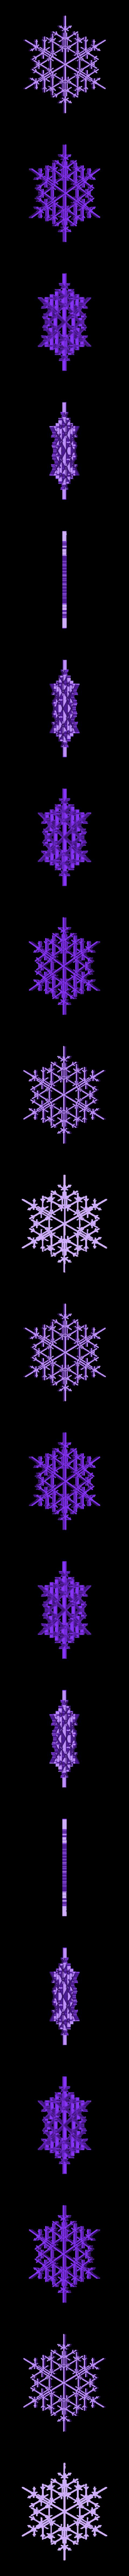 snowflake8.stl Download free STL file Random fractal snowflake in BlocksCAD • 3D printer model, arpruss